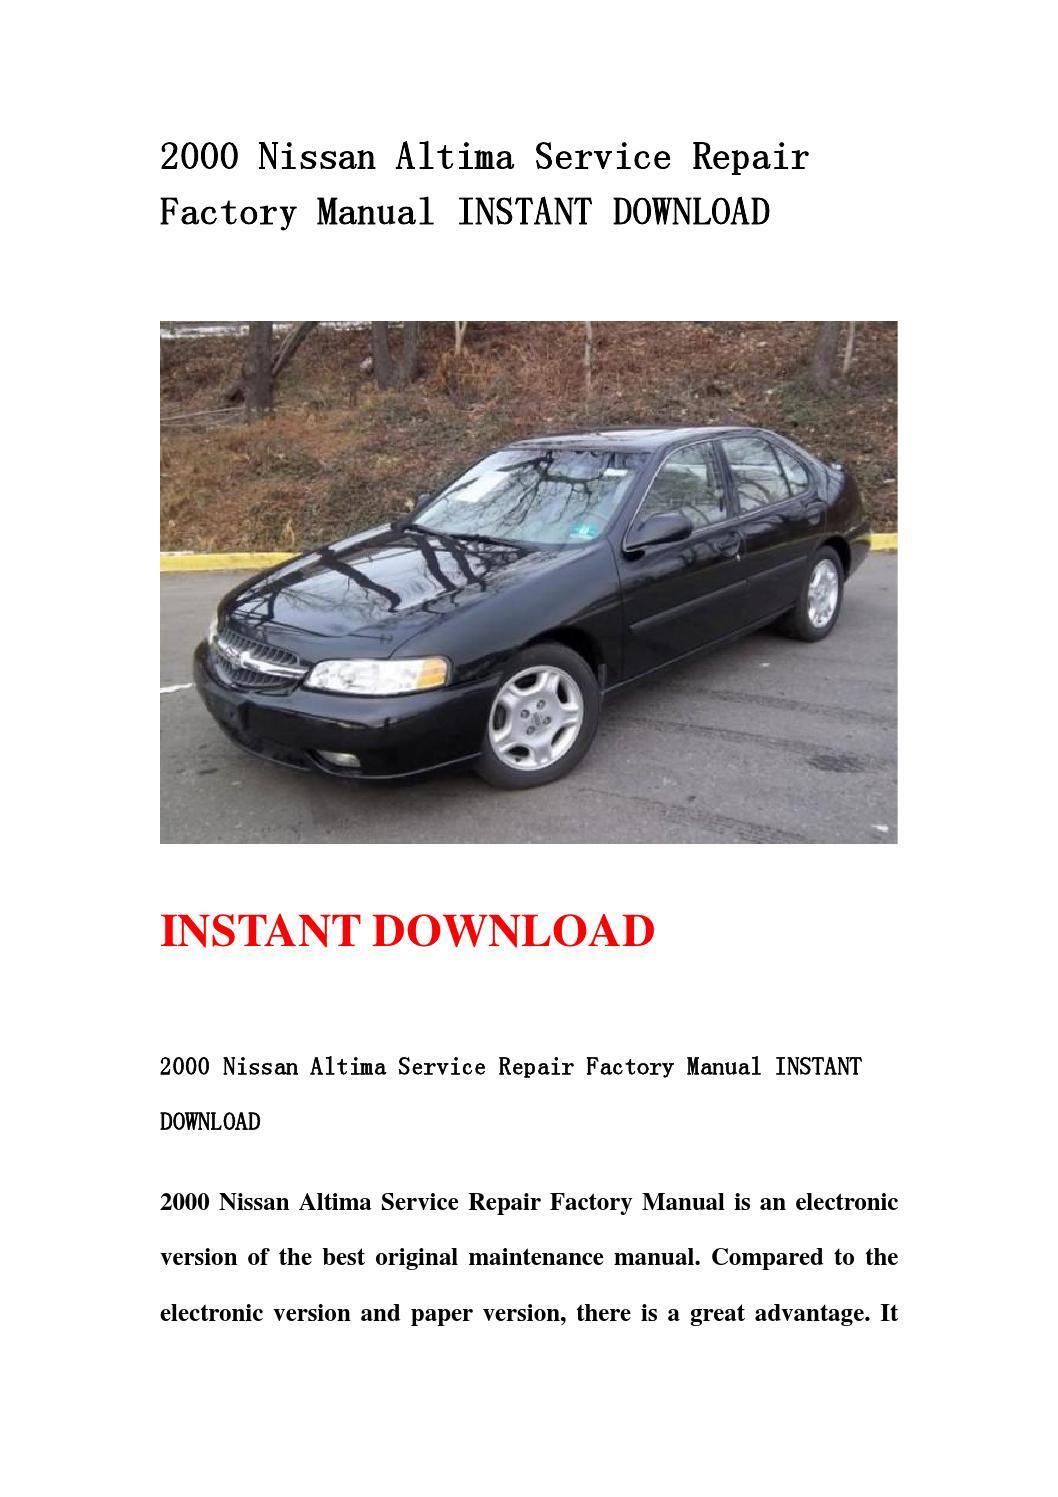 citroen c3 owners manual 2003 pdf car owners manuals